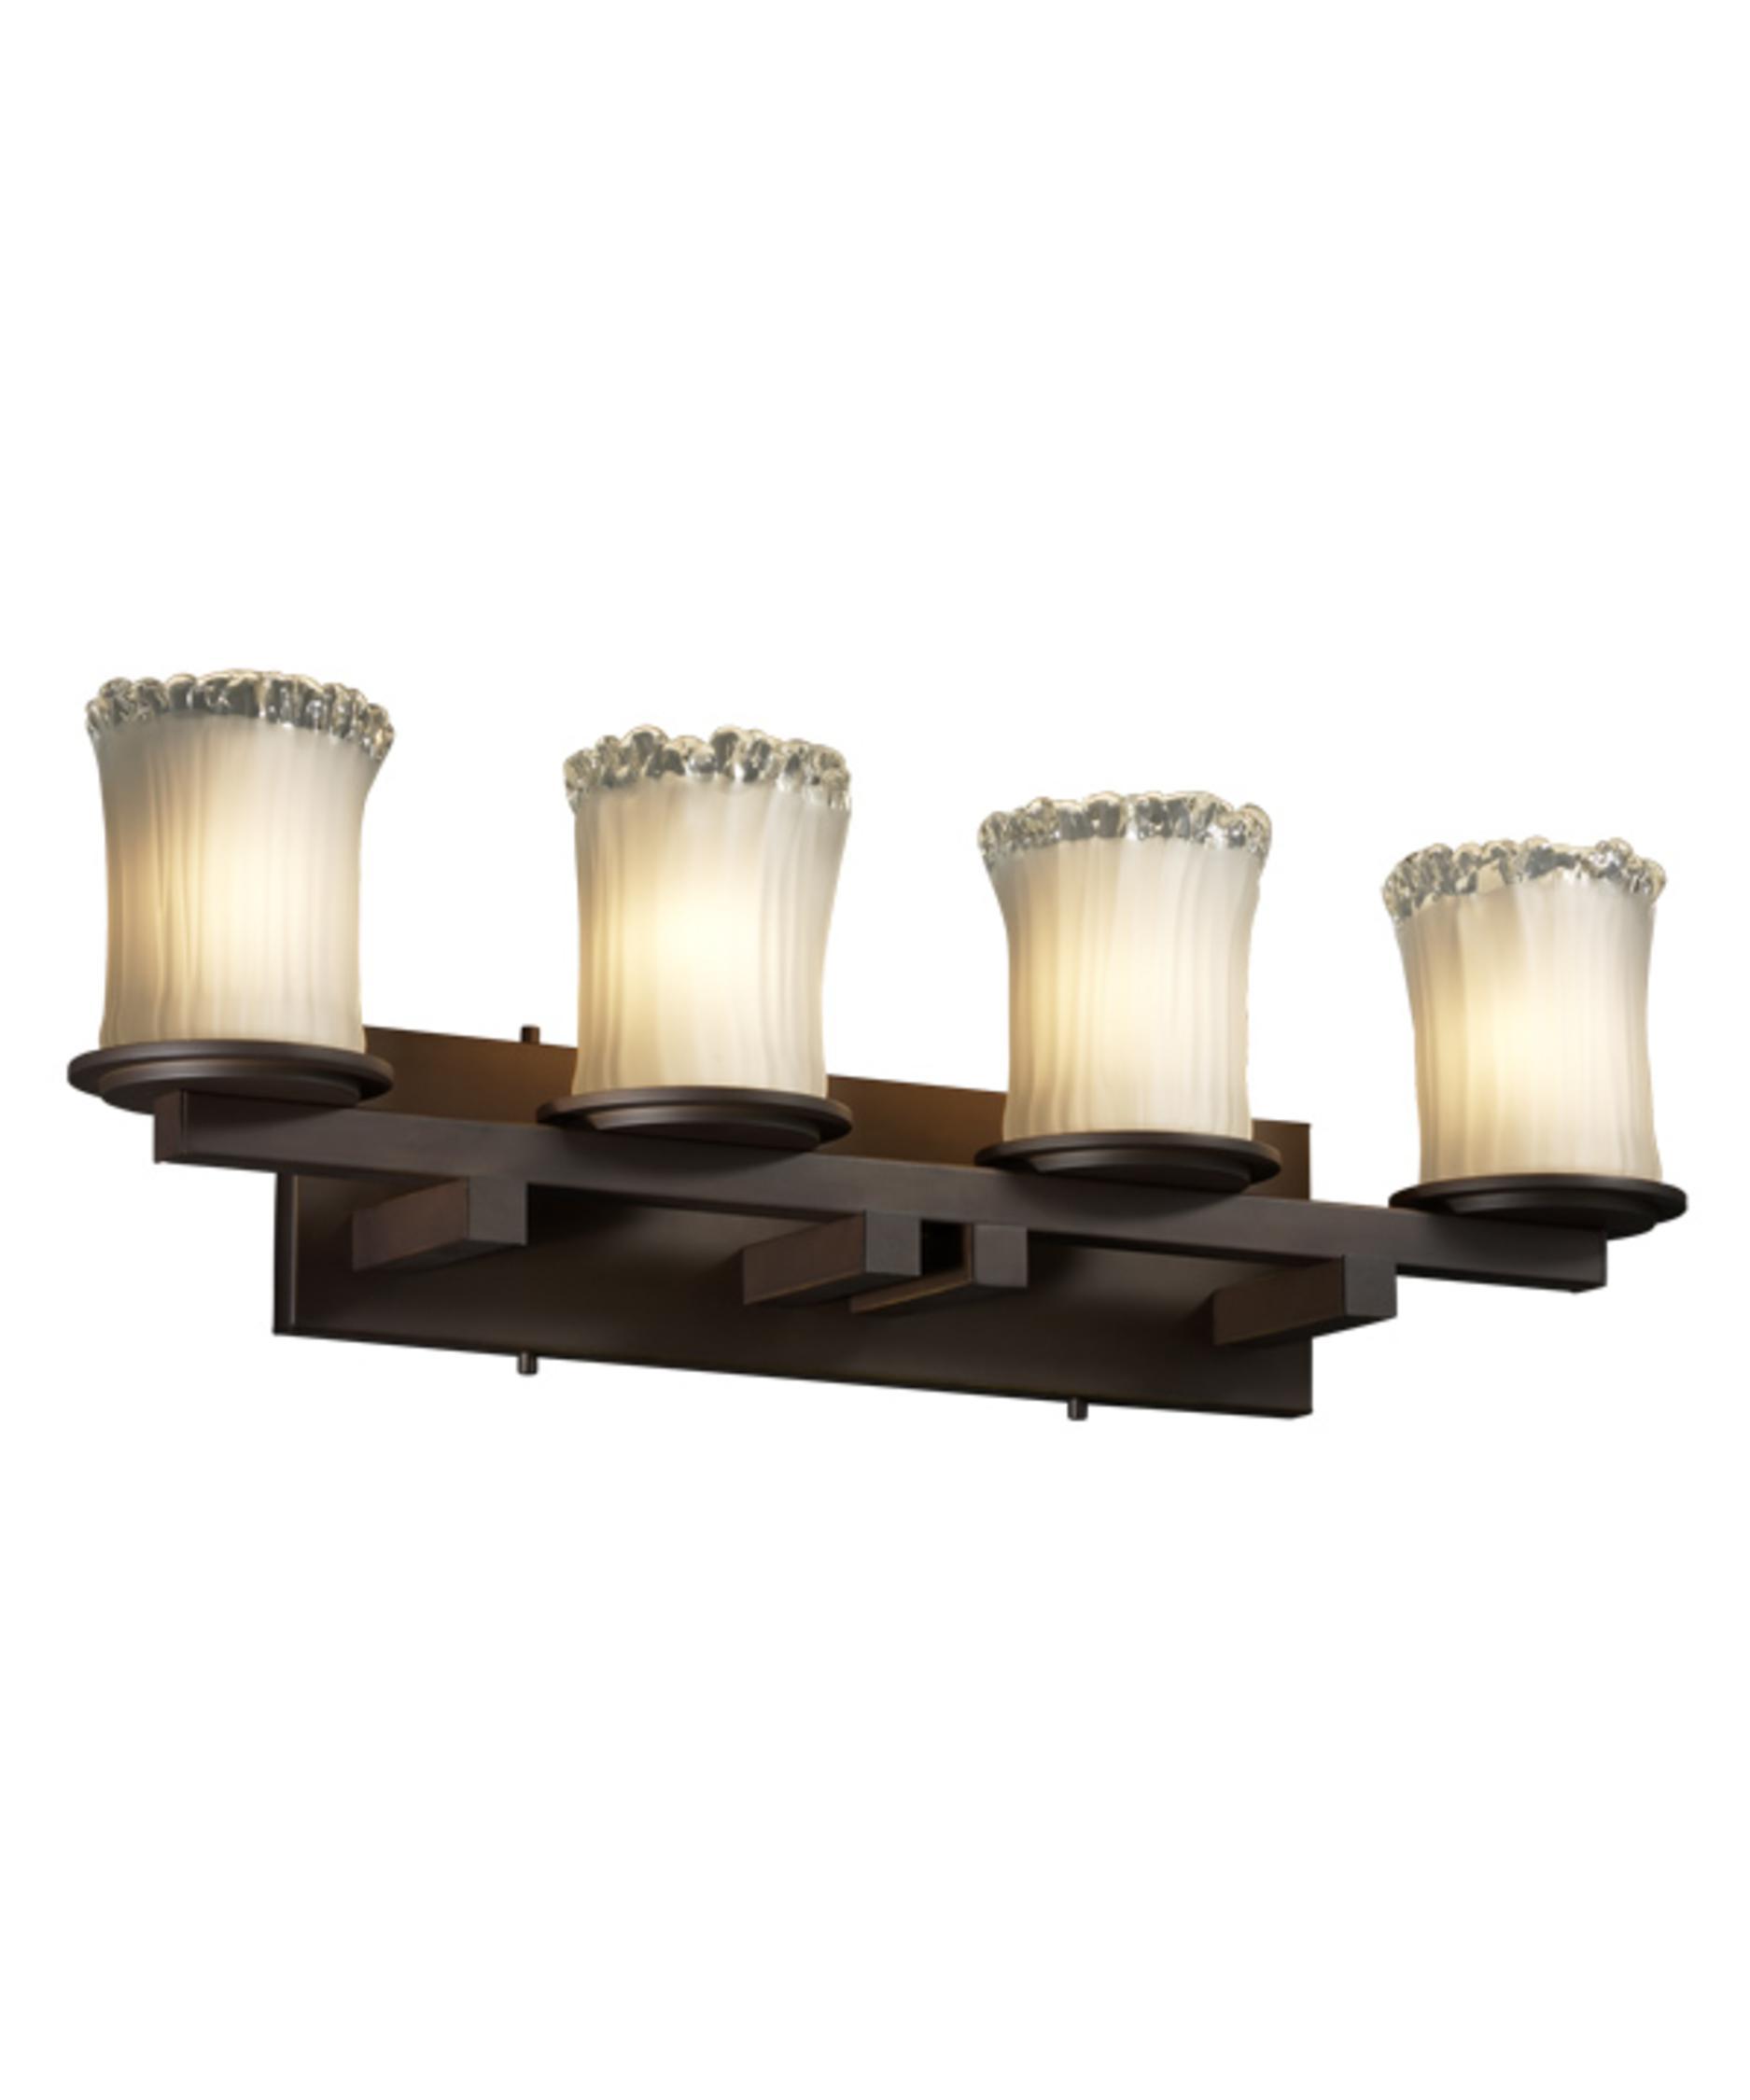 Justice Design Group GLA 8774 Veneto Luce Dakota 29 Inch Bath Vanity Light